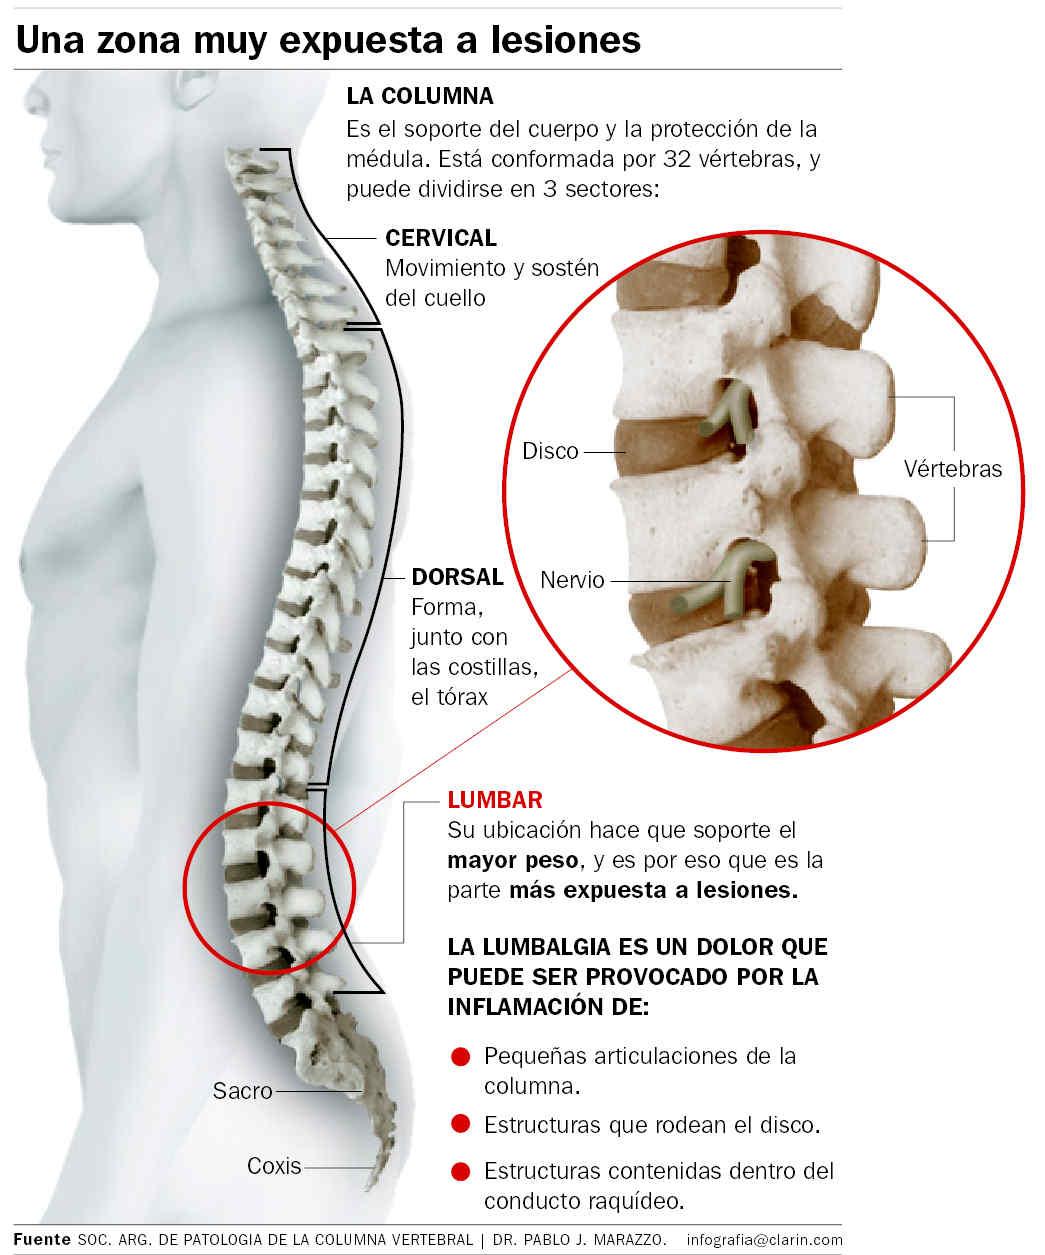 Ejercicios para dolores lumbares